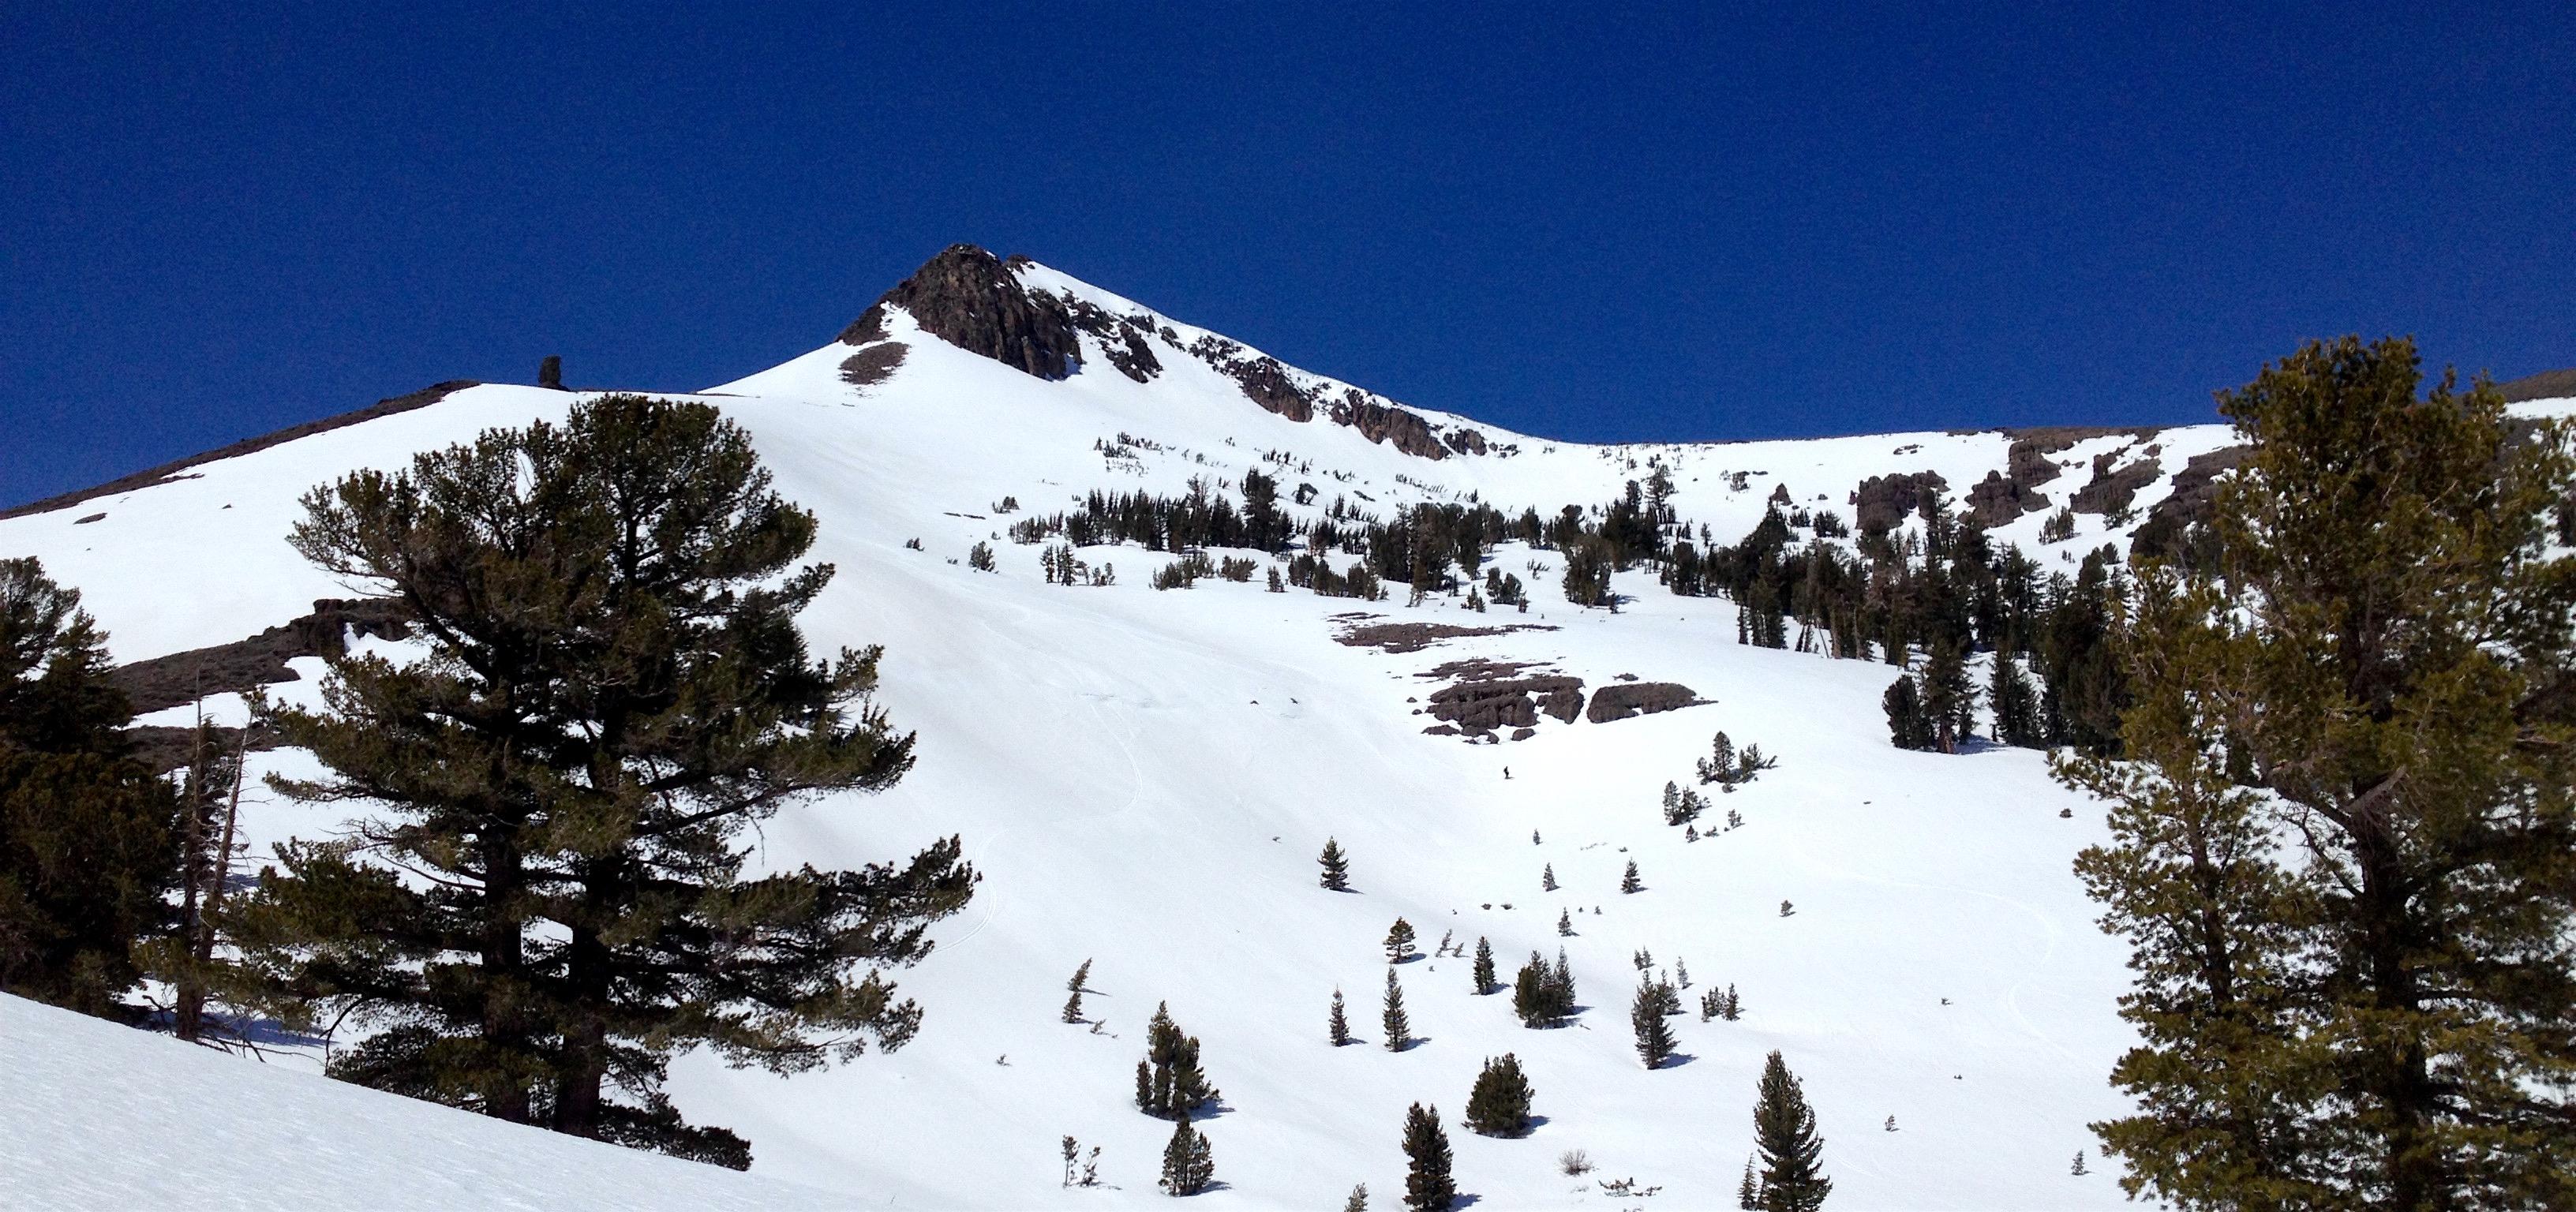 Stevens Peak today. photo: miles clark/snowbrains